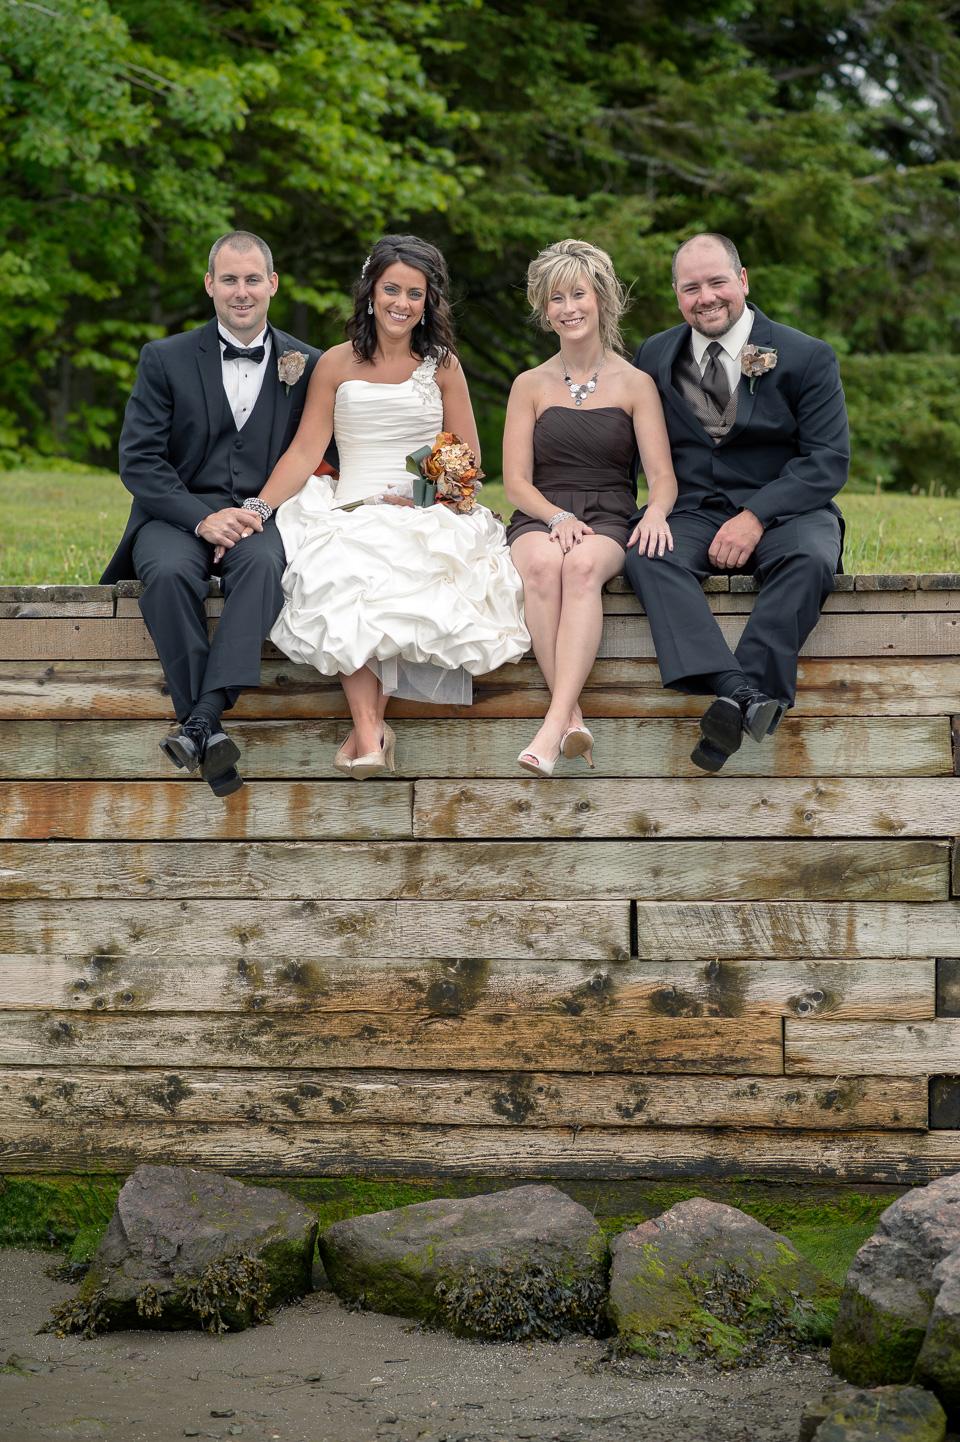 NIgel Fearon Photography | The LeBlanc Wedding-53.jpg